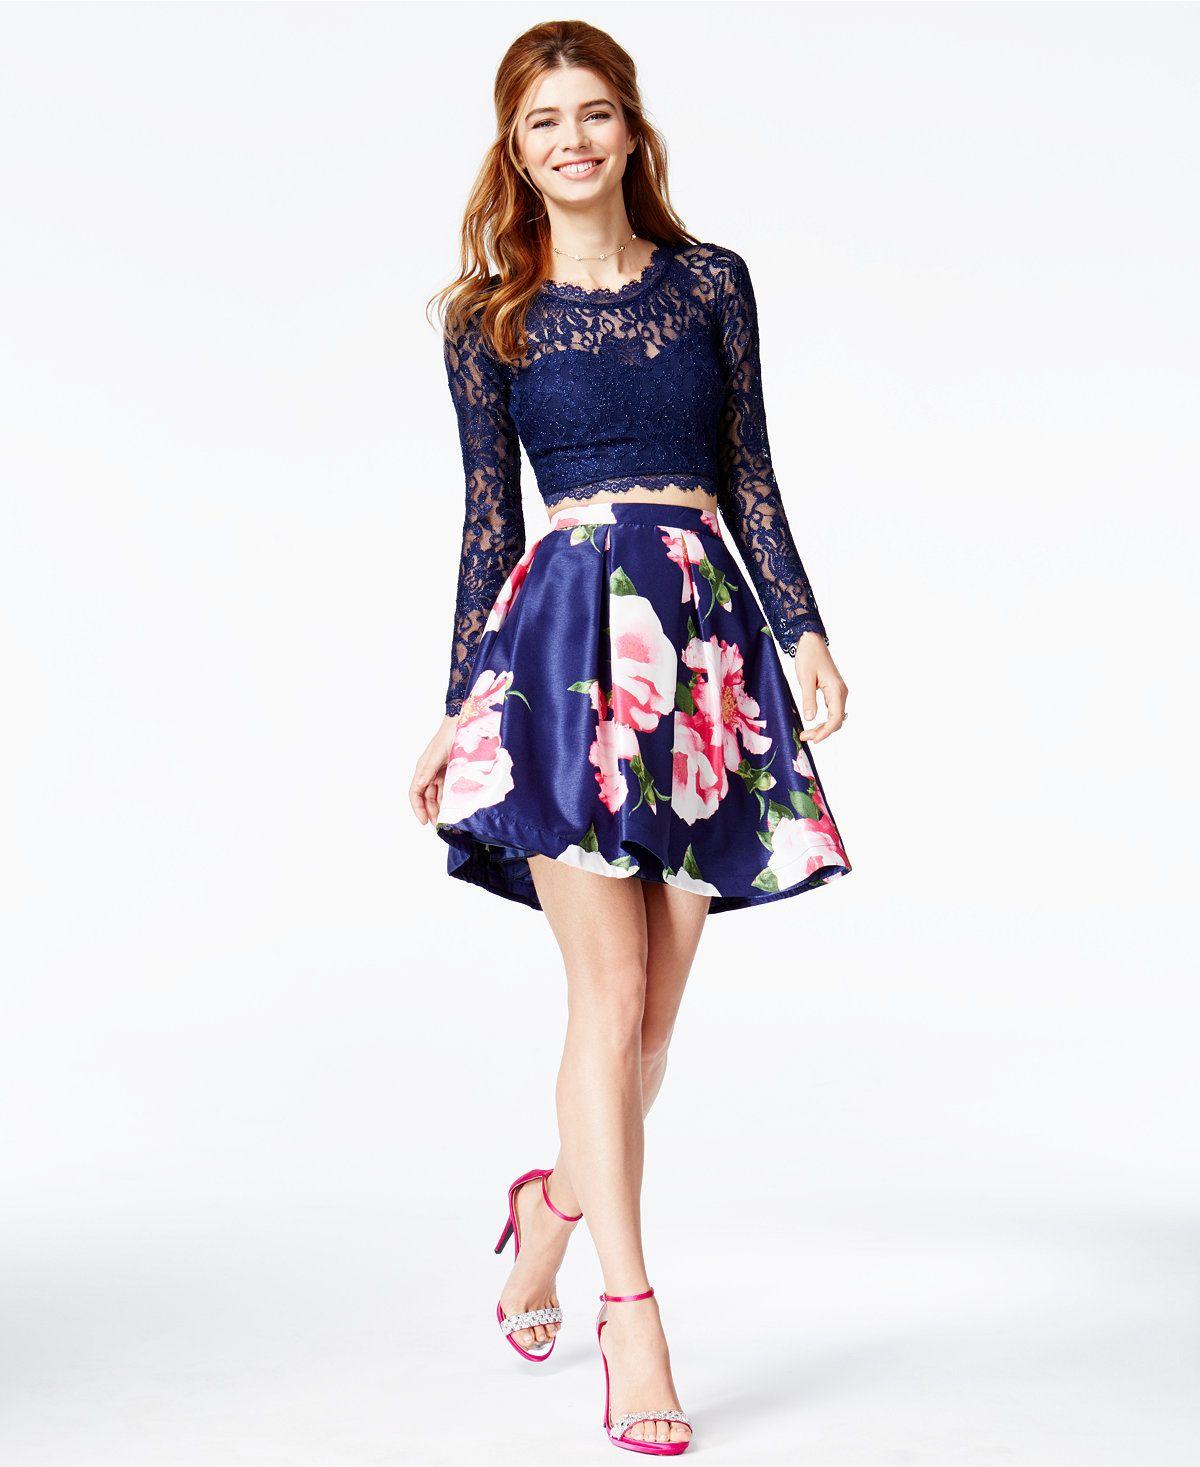 9ec08dbbf4 2 Piece Homecoming Dresses Macys - Data Dynamic AG